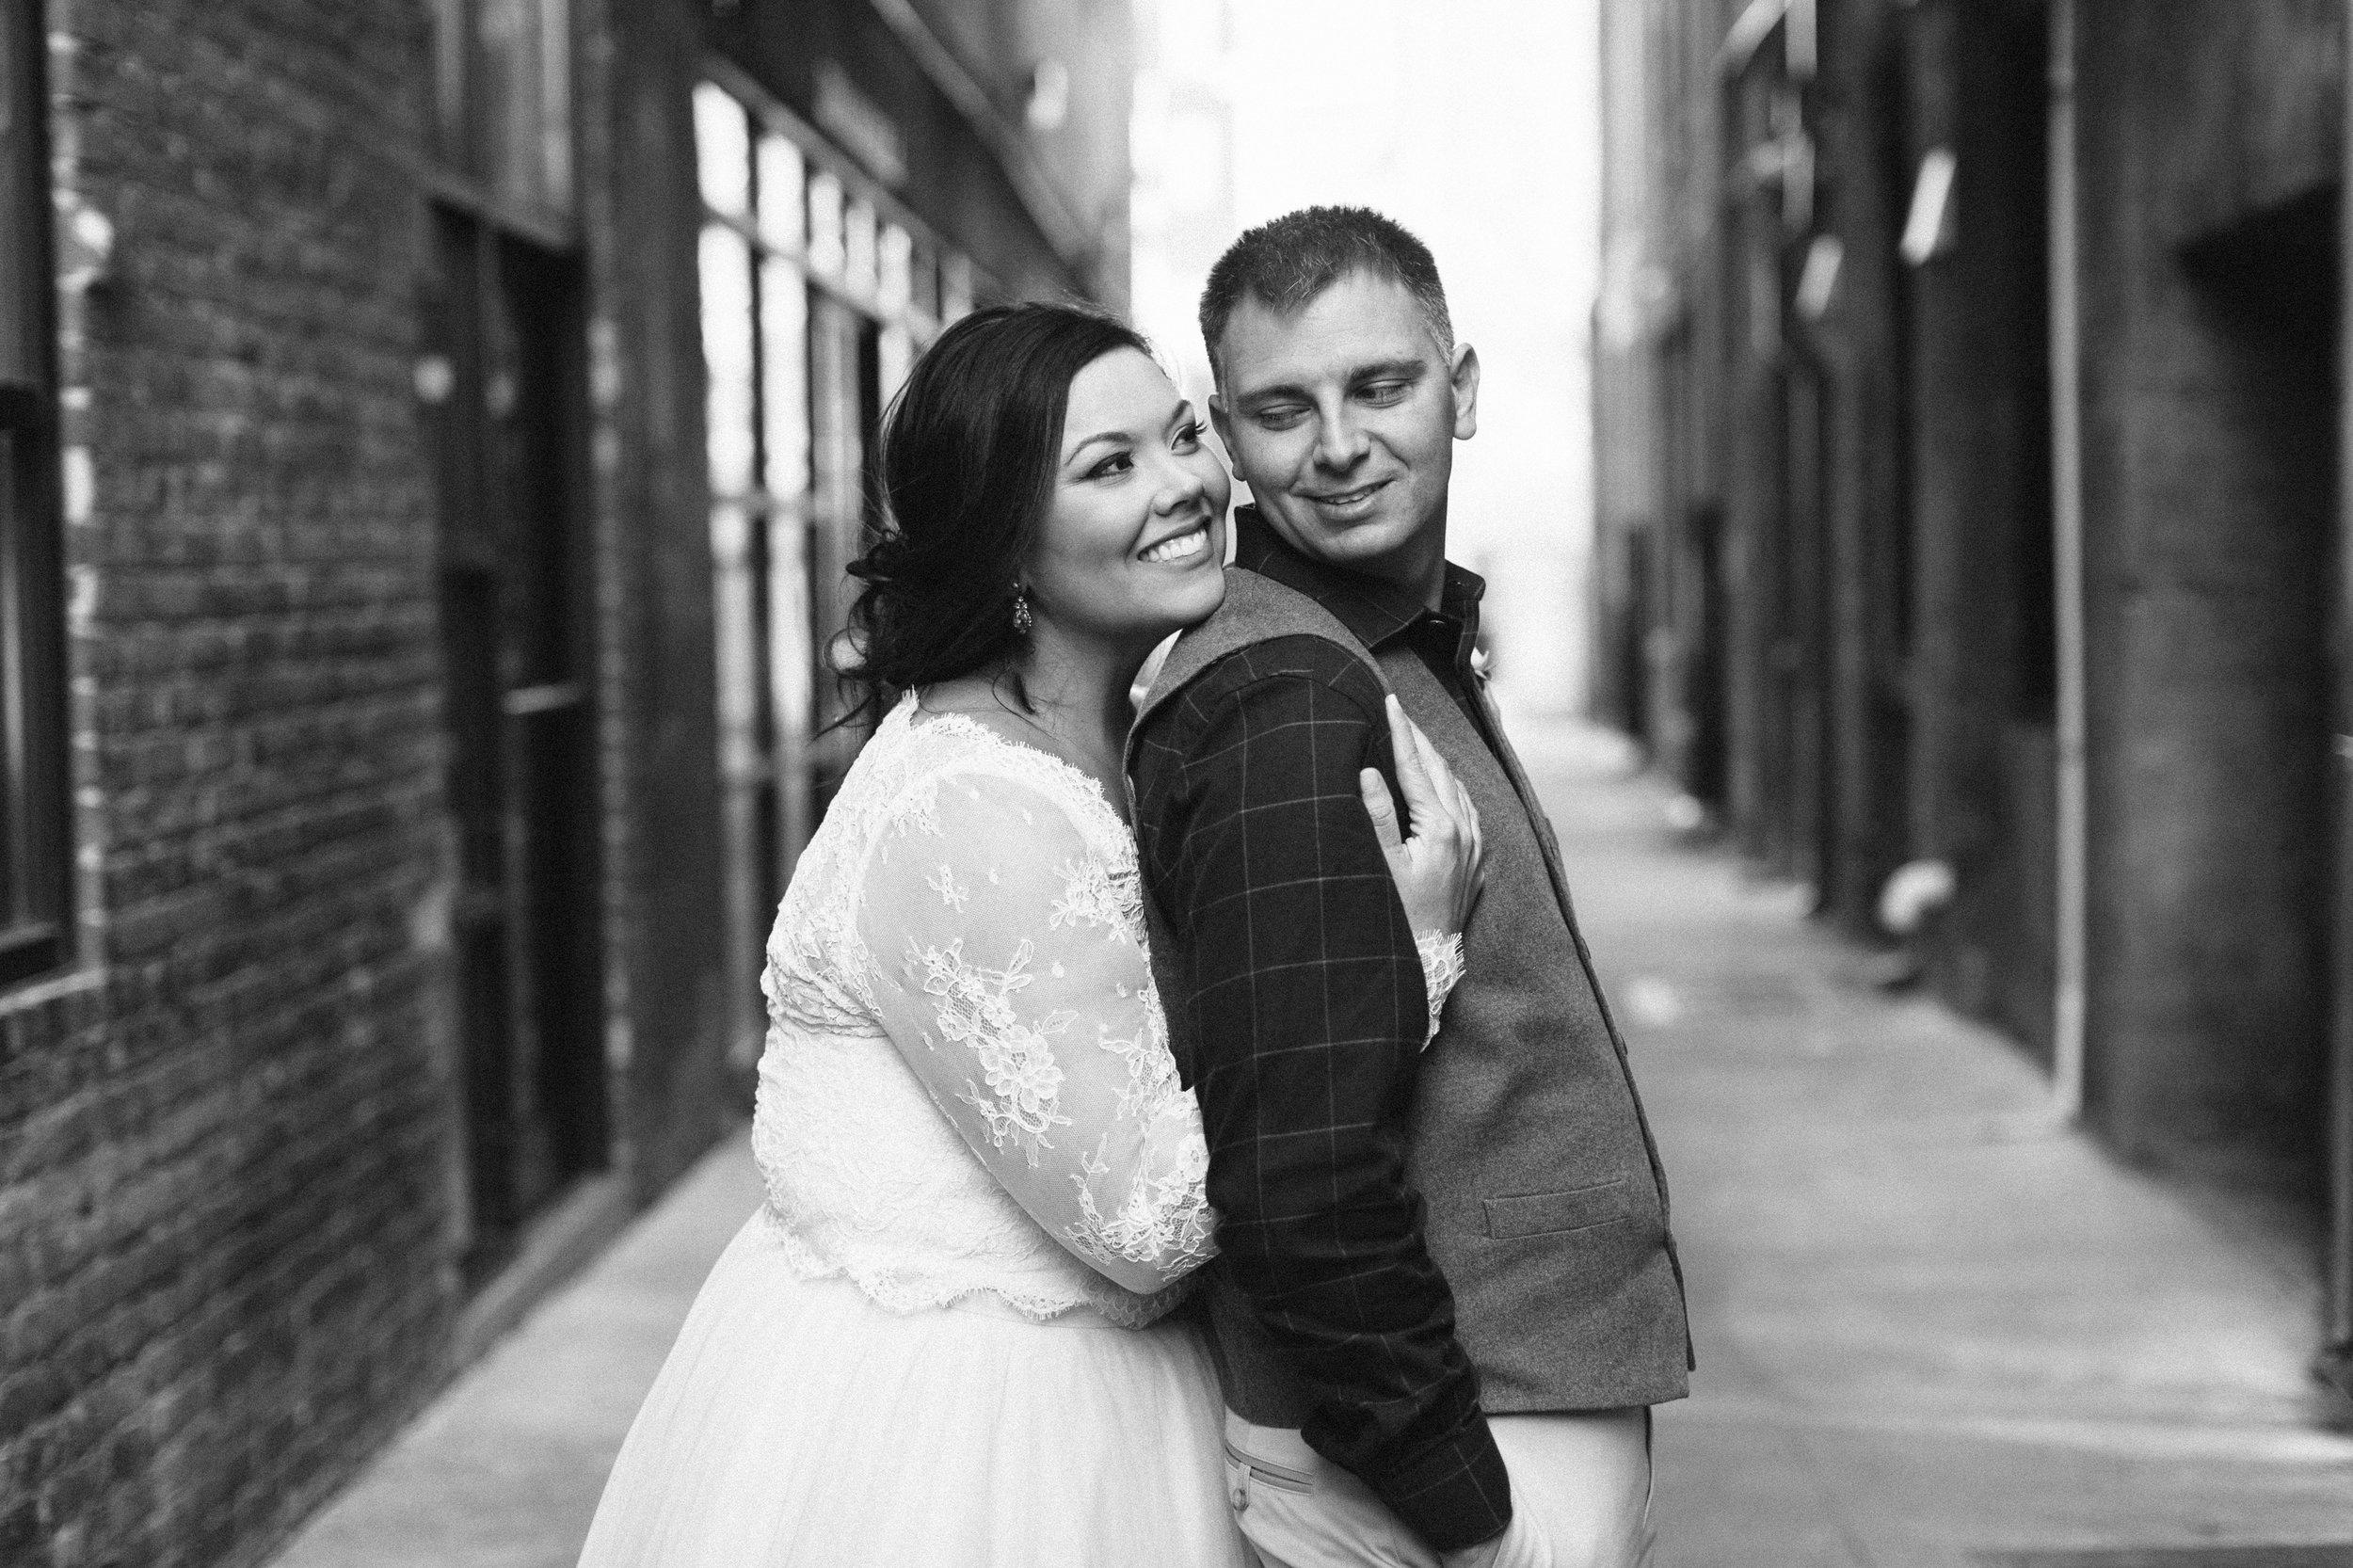 Lauren_Jeremy_Standard_Wedding_Knoxville_Abigail_Malone_Photography_FIlm-296.jpg